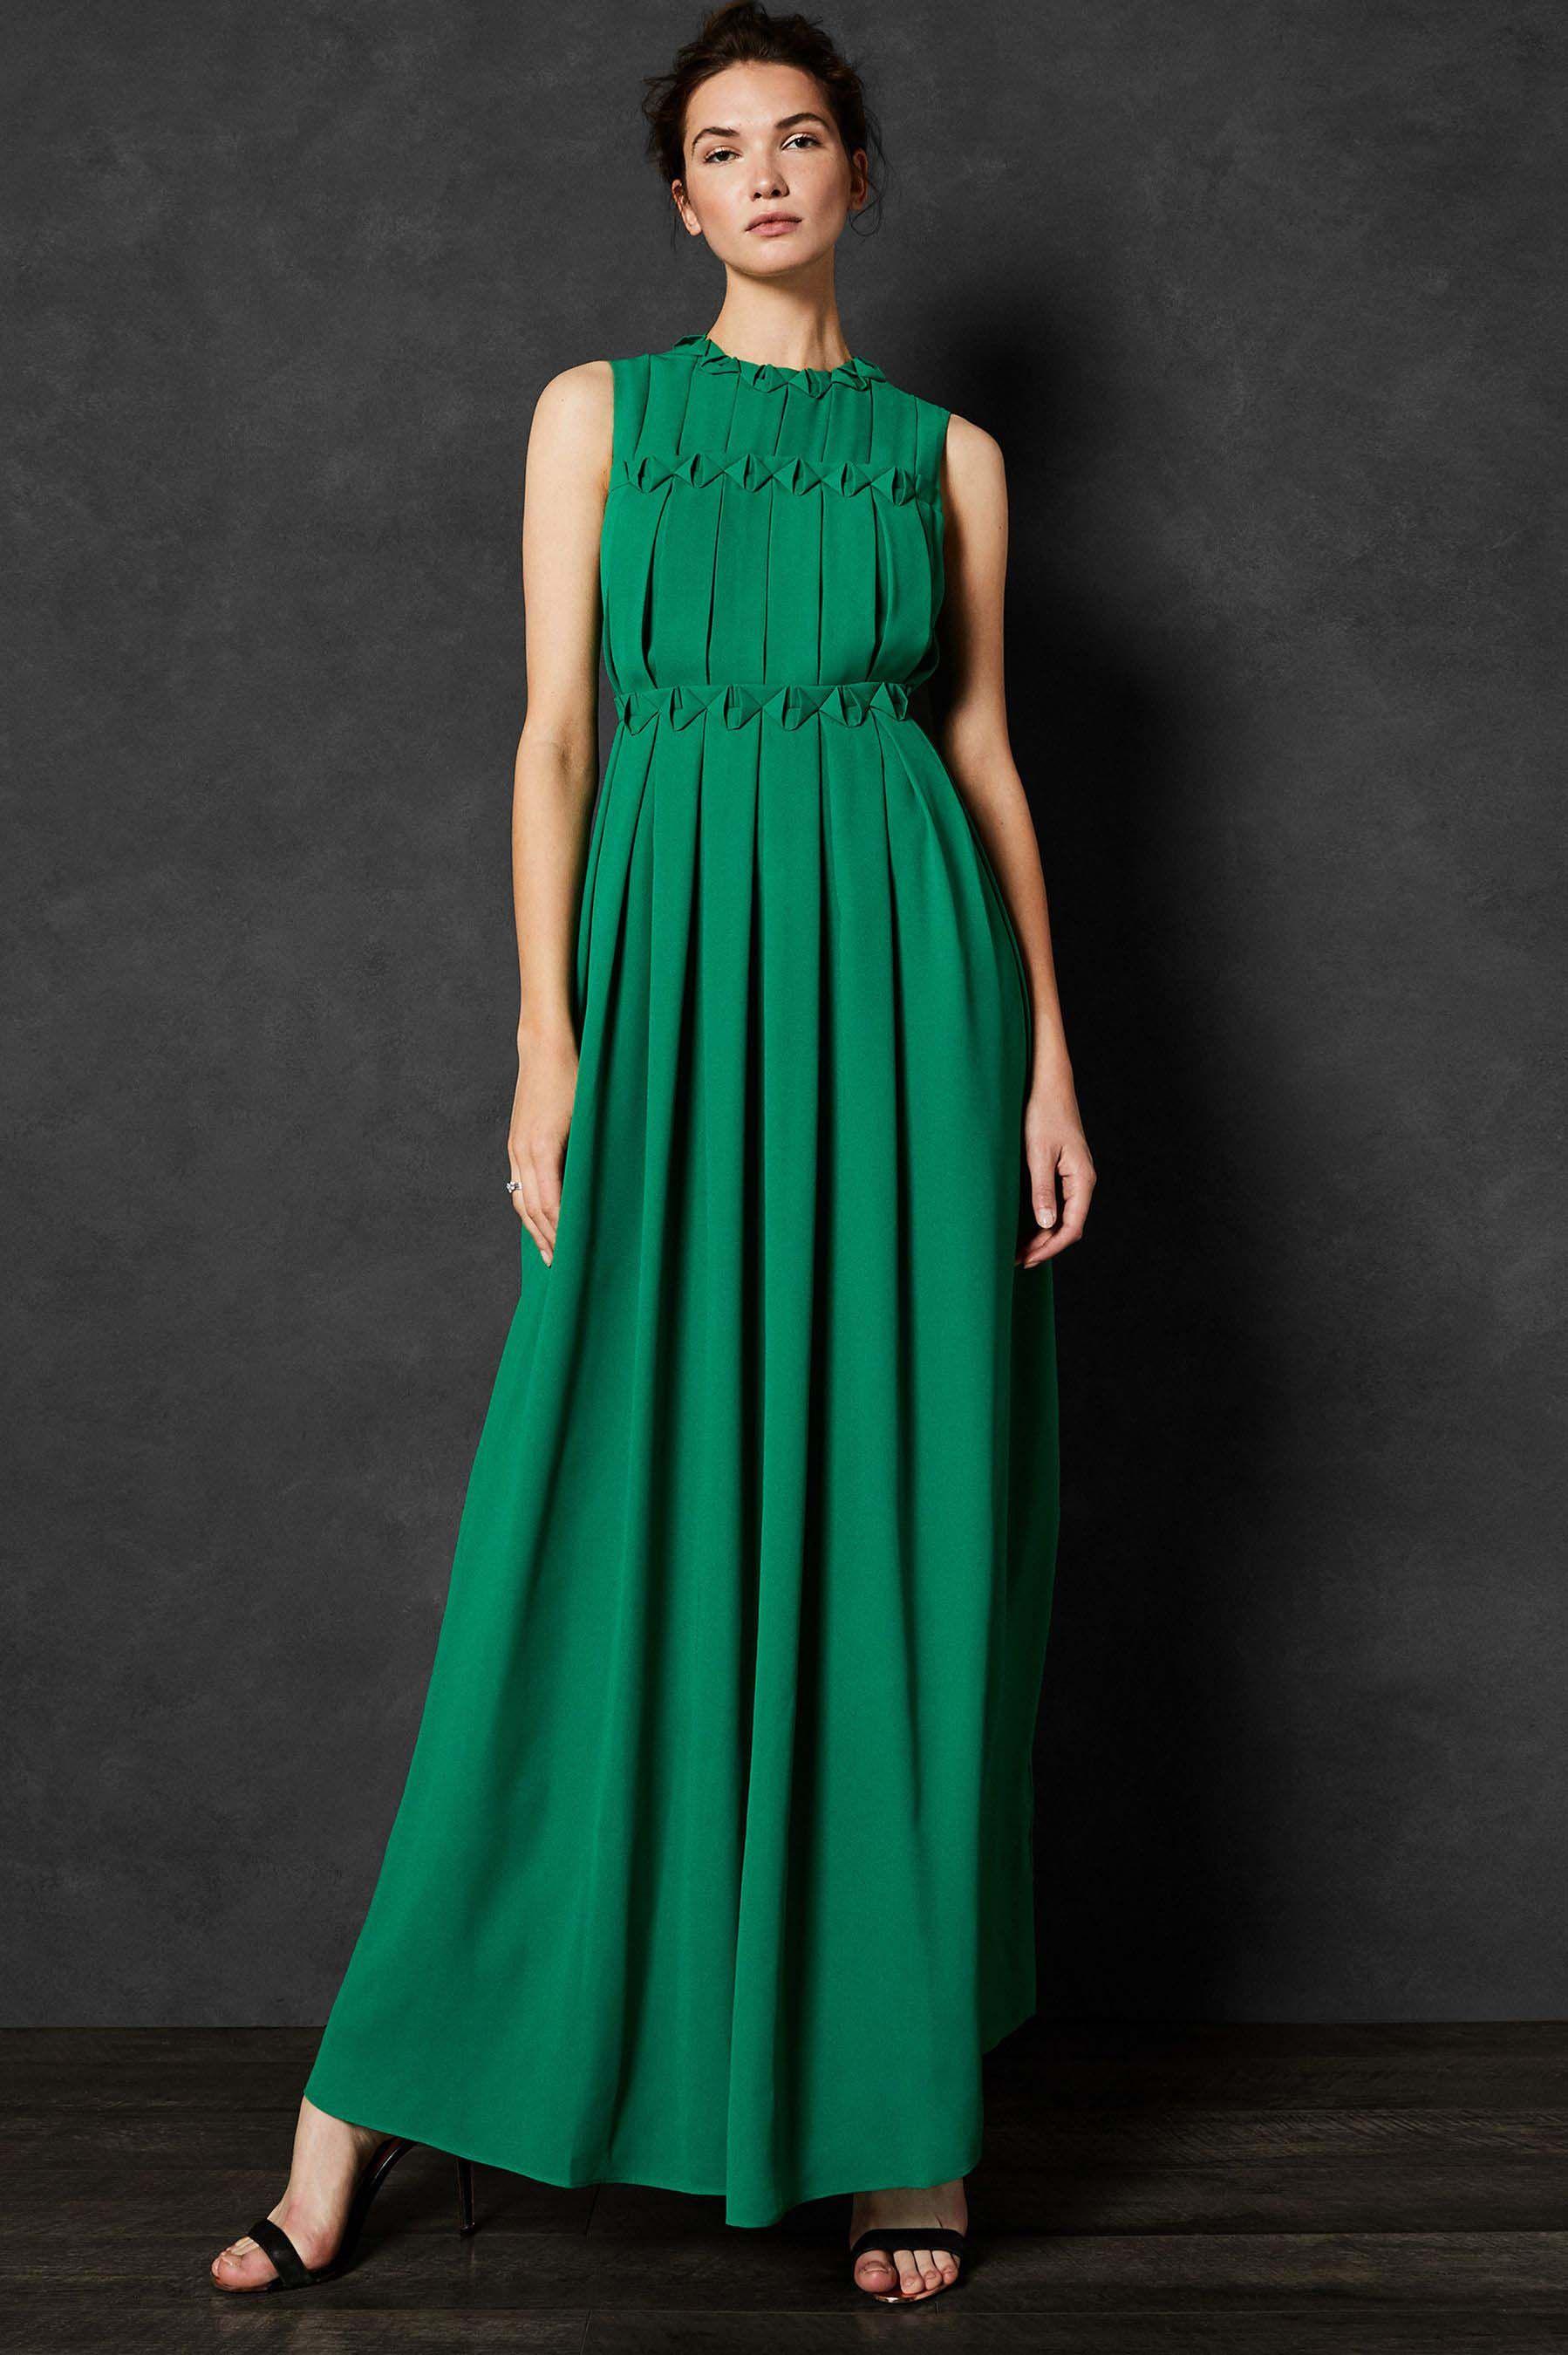 666bb5f0c9837 Womens Ted Baker Pleated Maxi Dress - Green